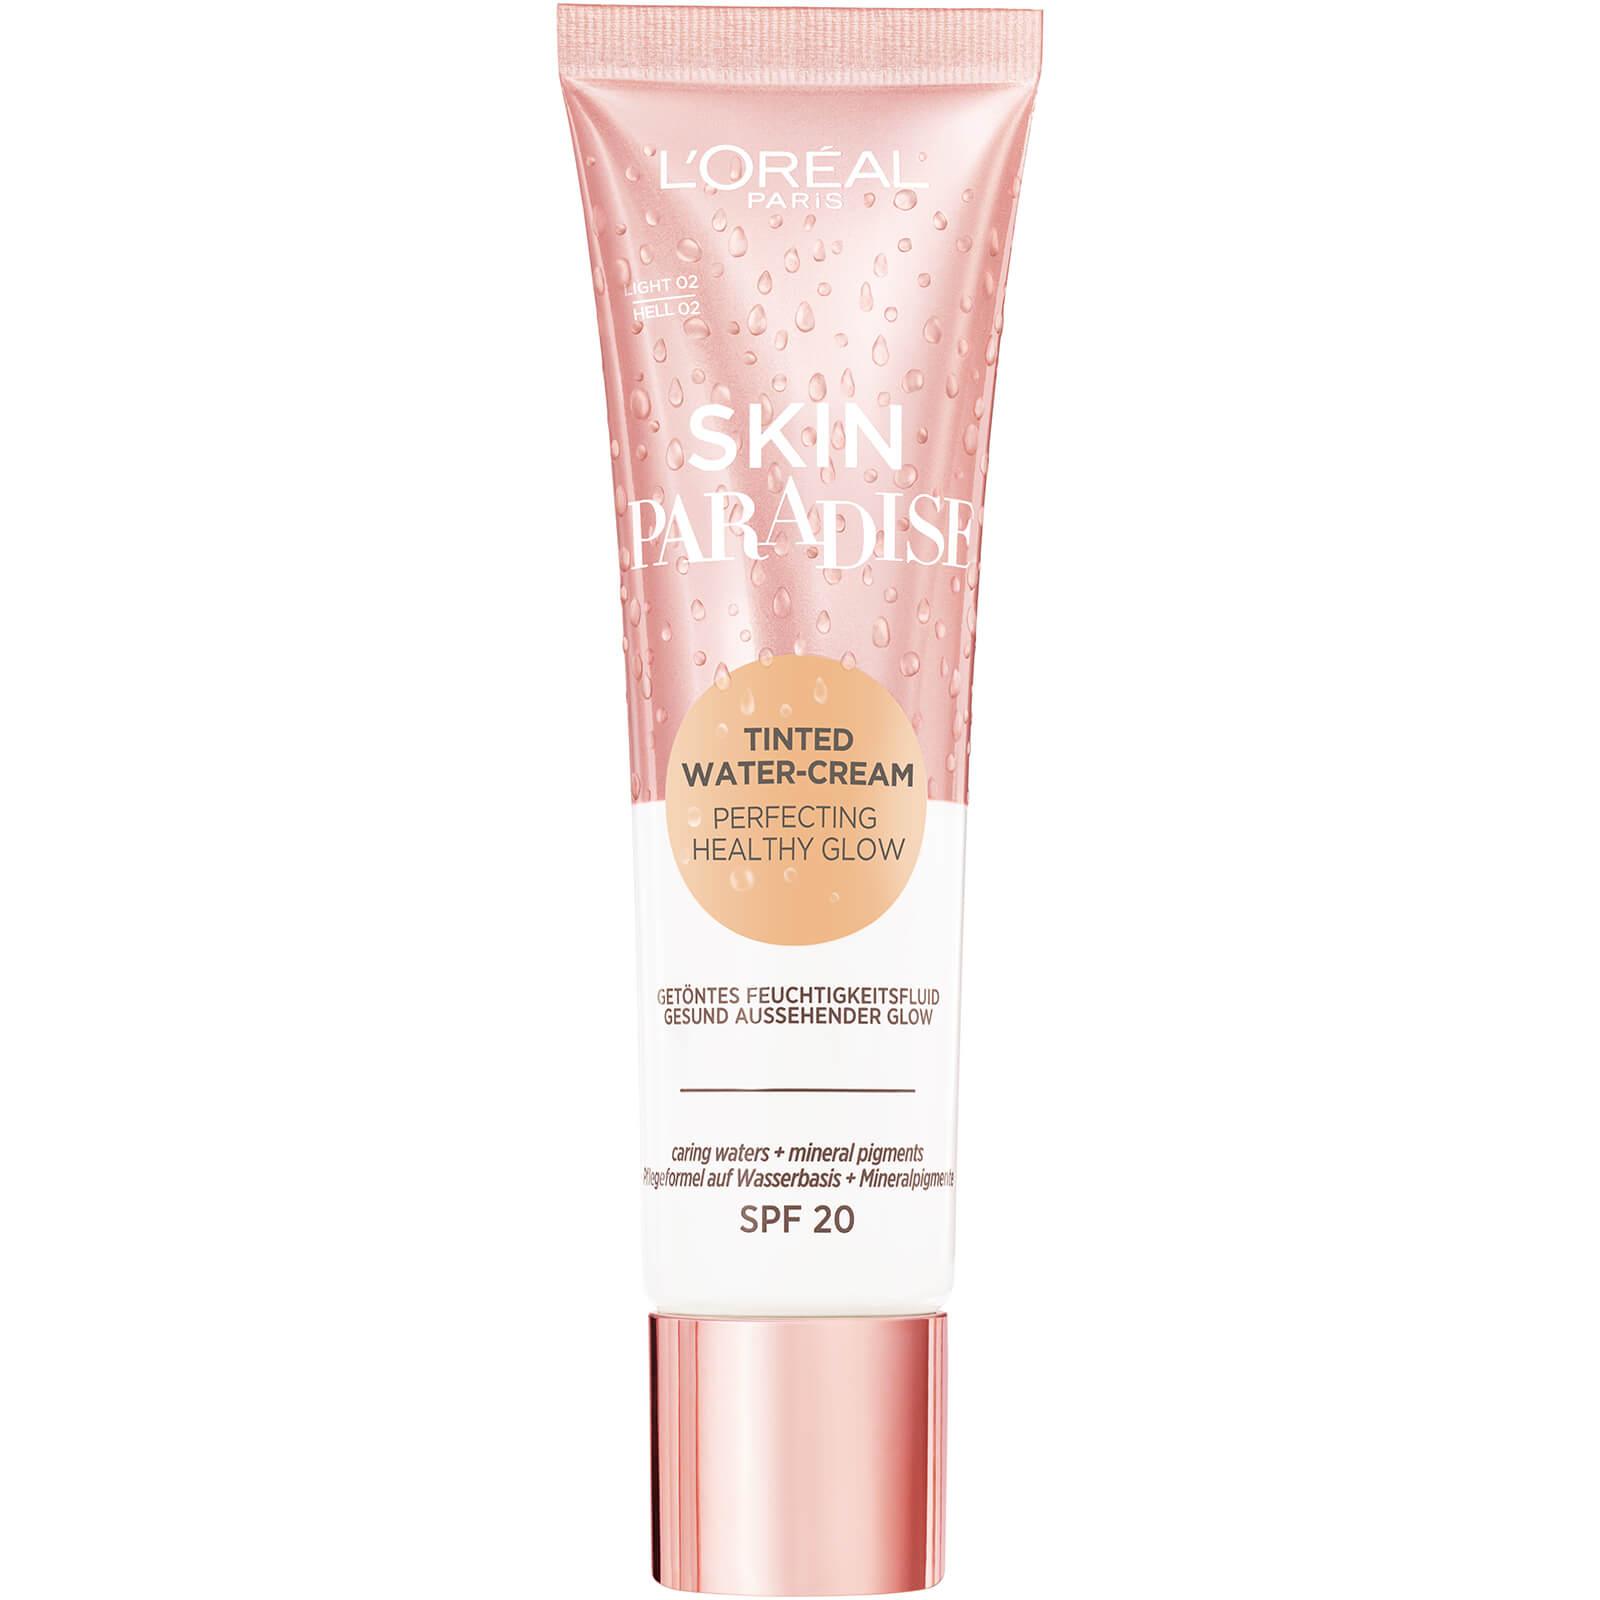 Купить L'Oréal Paris Skin Paradise Tinted Moisturiser SPF20 30ml (Various Shades) - Light 02